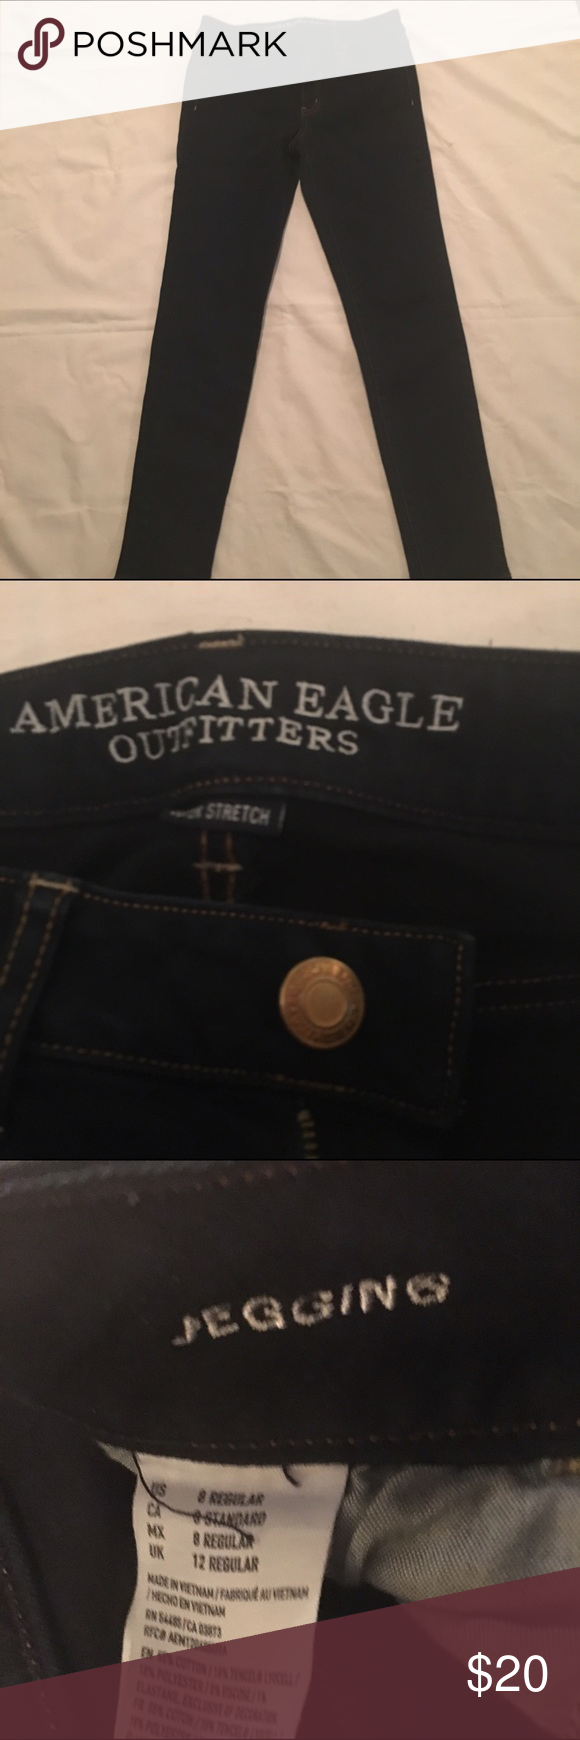 AE Denim Jeggings Like new! Dark wash jeggings American Eagle Outfitters Jeans Skinny